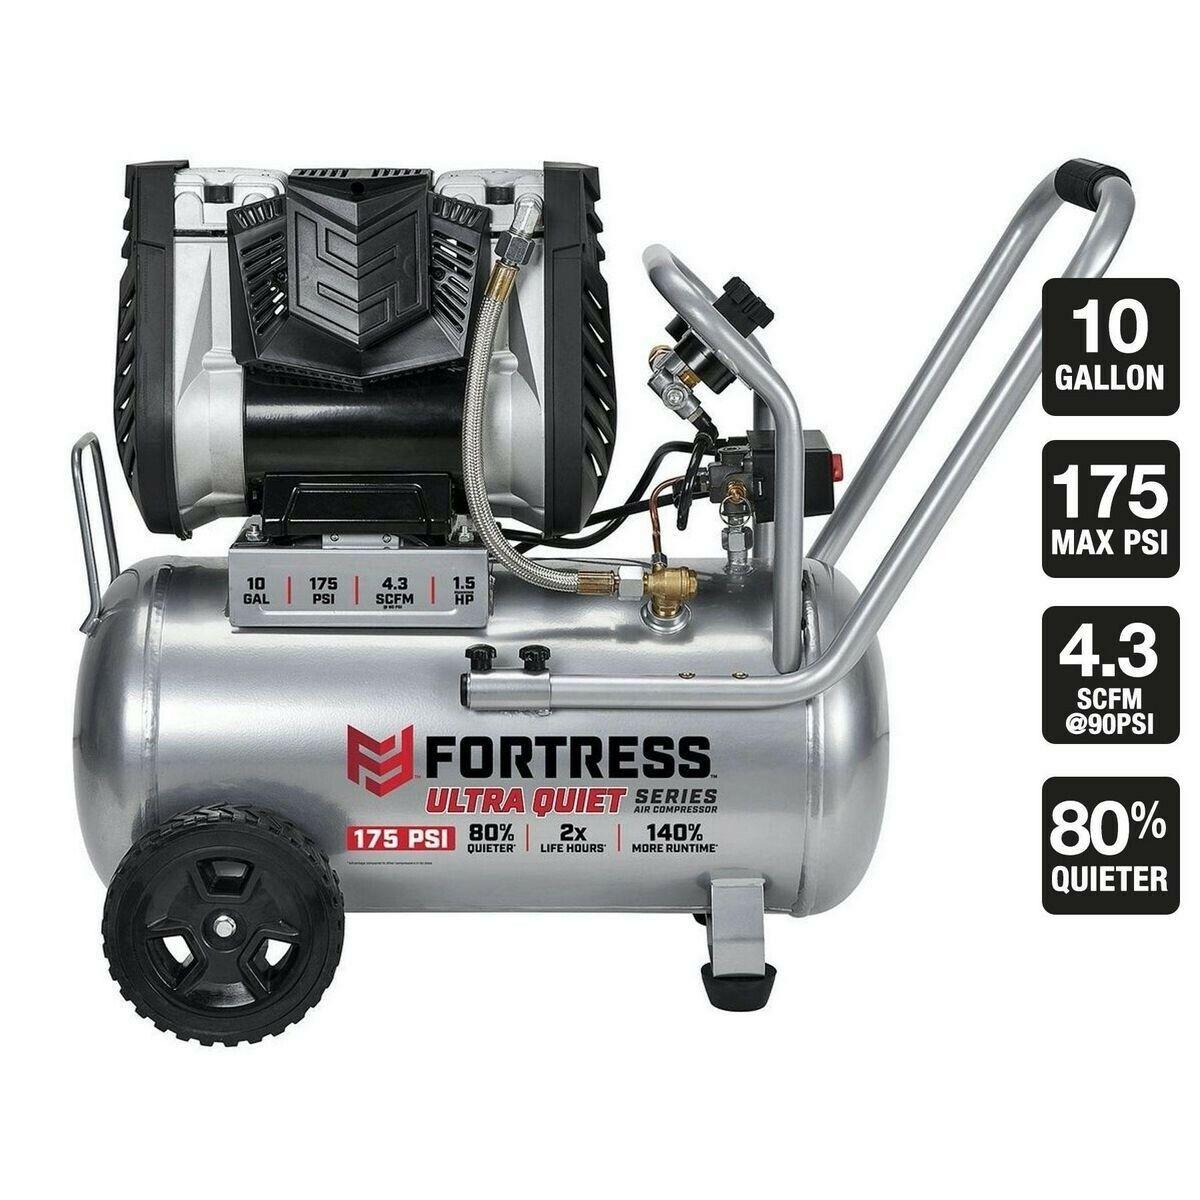 FORTRESS 10 Gallon 175 PSI Ultra Quiet Horizontal Shop/Auto Air Compressor+Bonus. Buy it now for 349.99